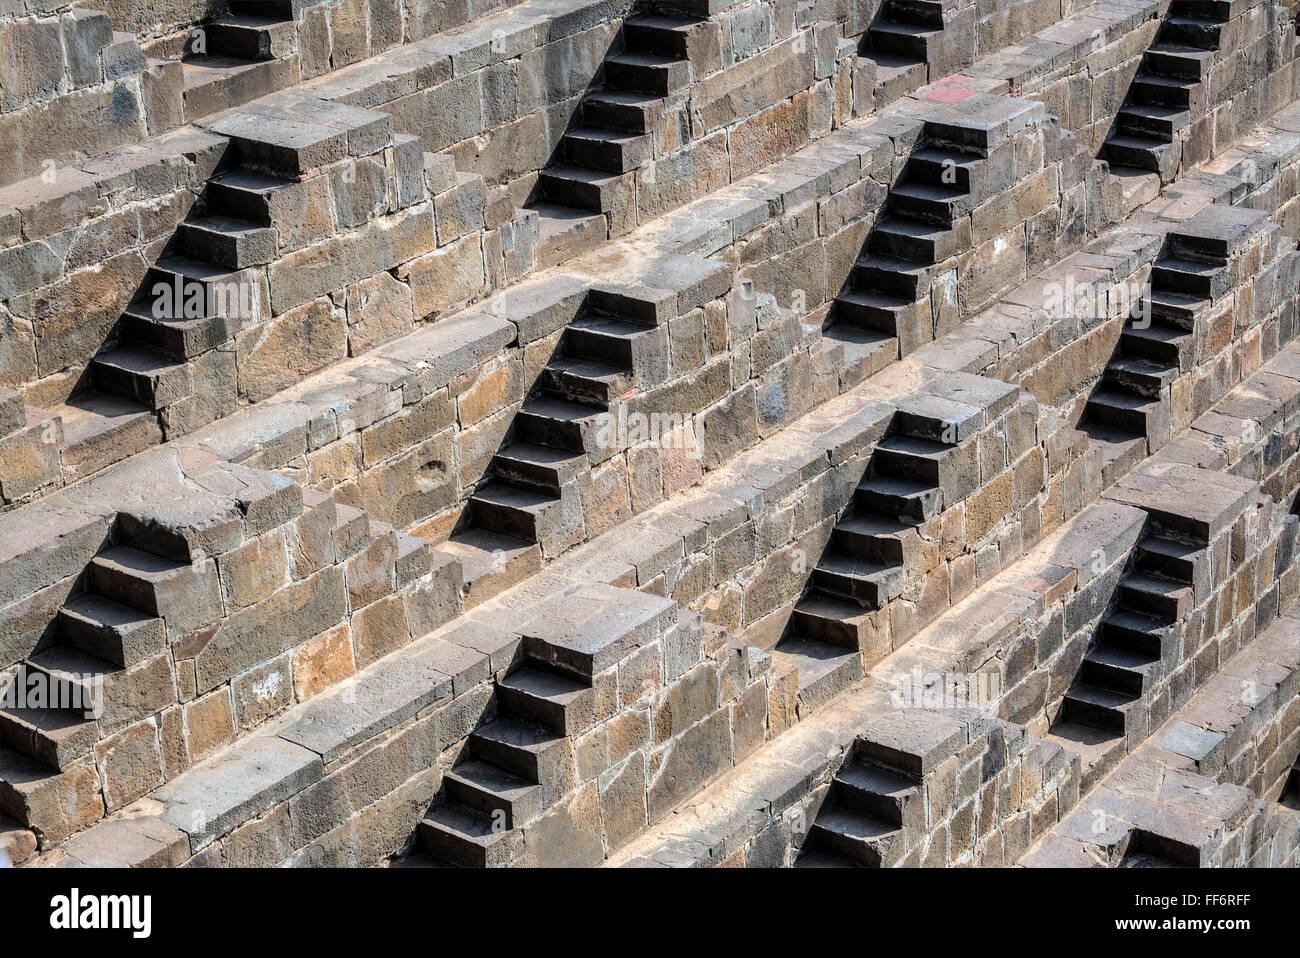 Chand Baori Stufenbrunnen, Abhaneri, Dausa, Rajasthan, Indien Stockbild